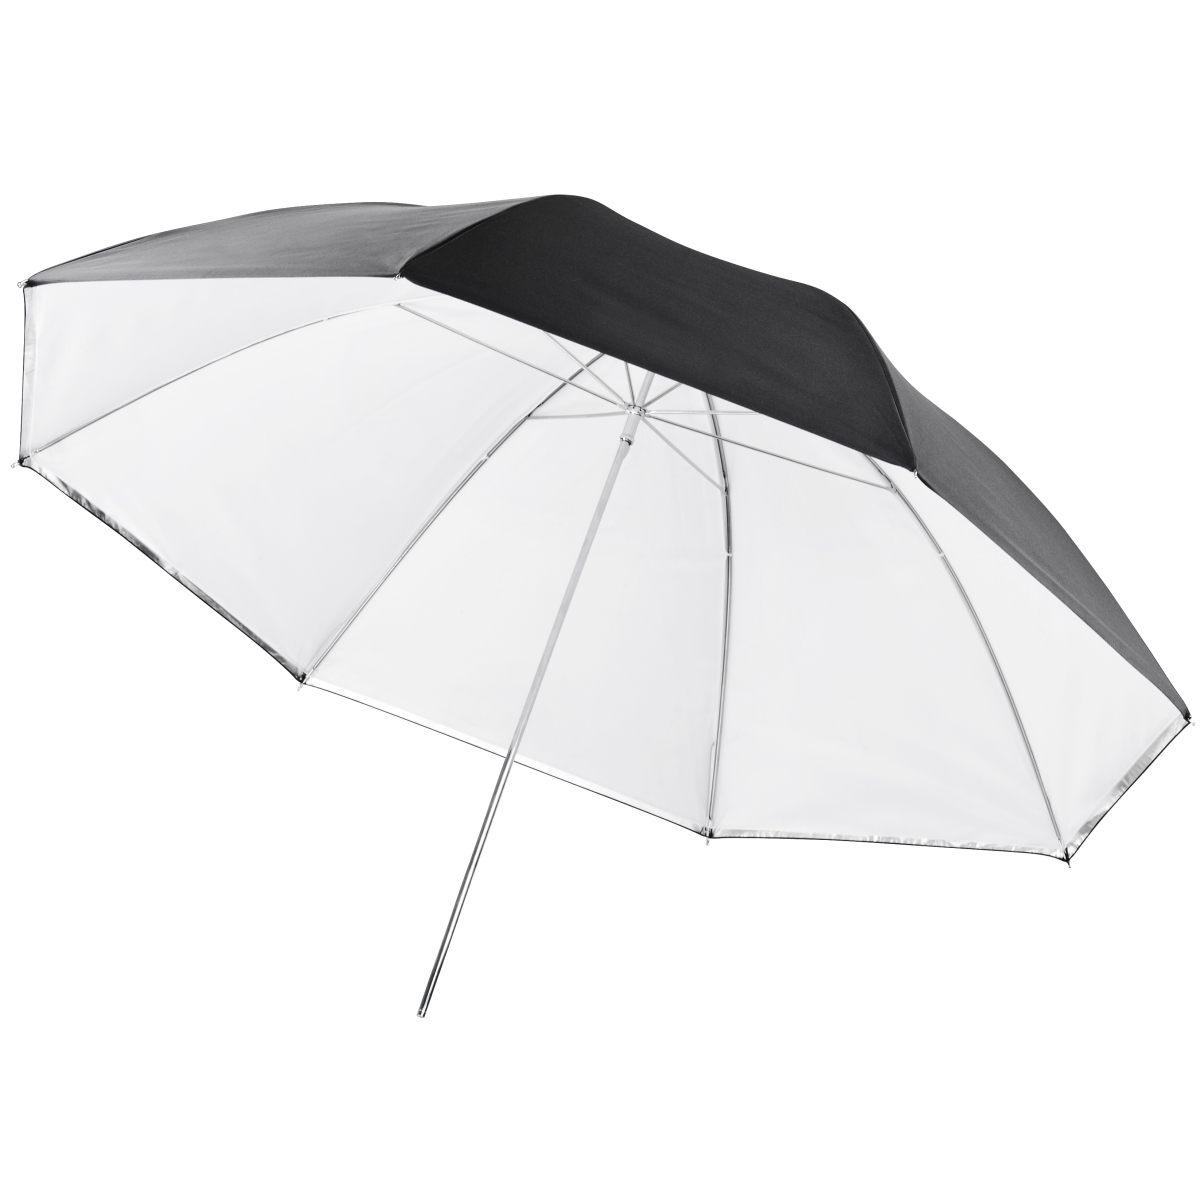 Walimex 2in1 Reflex & Transl. Umbrella white 109cm